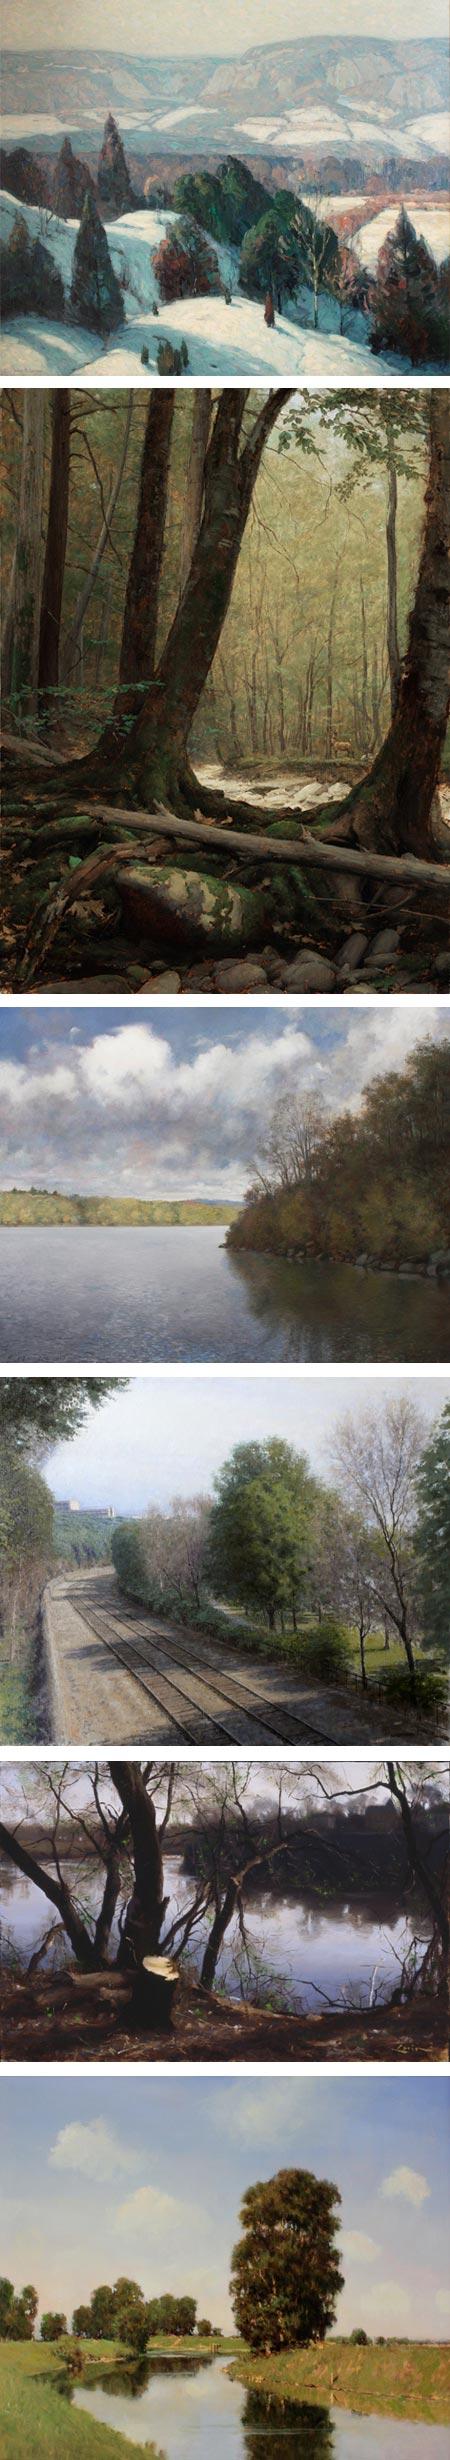 Landscapes at John Pence Gallery: John F. Carlson, Travis Schlaht, John Morra, Bennett Vadnais, Steven J. Levin, Donald Jurney